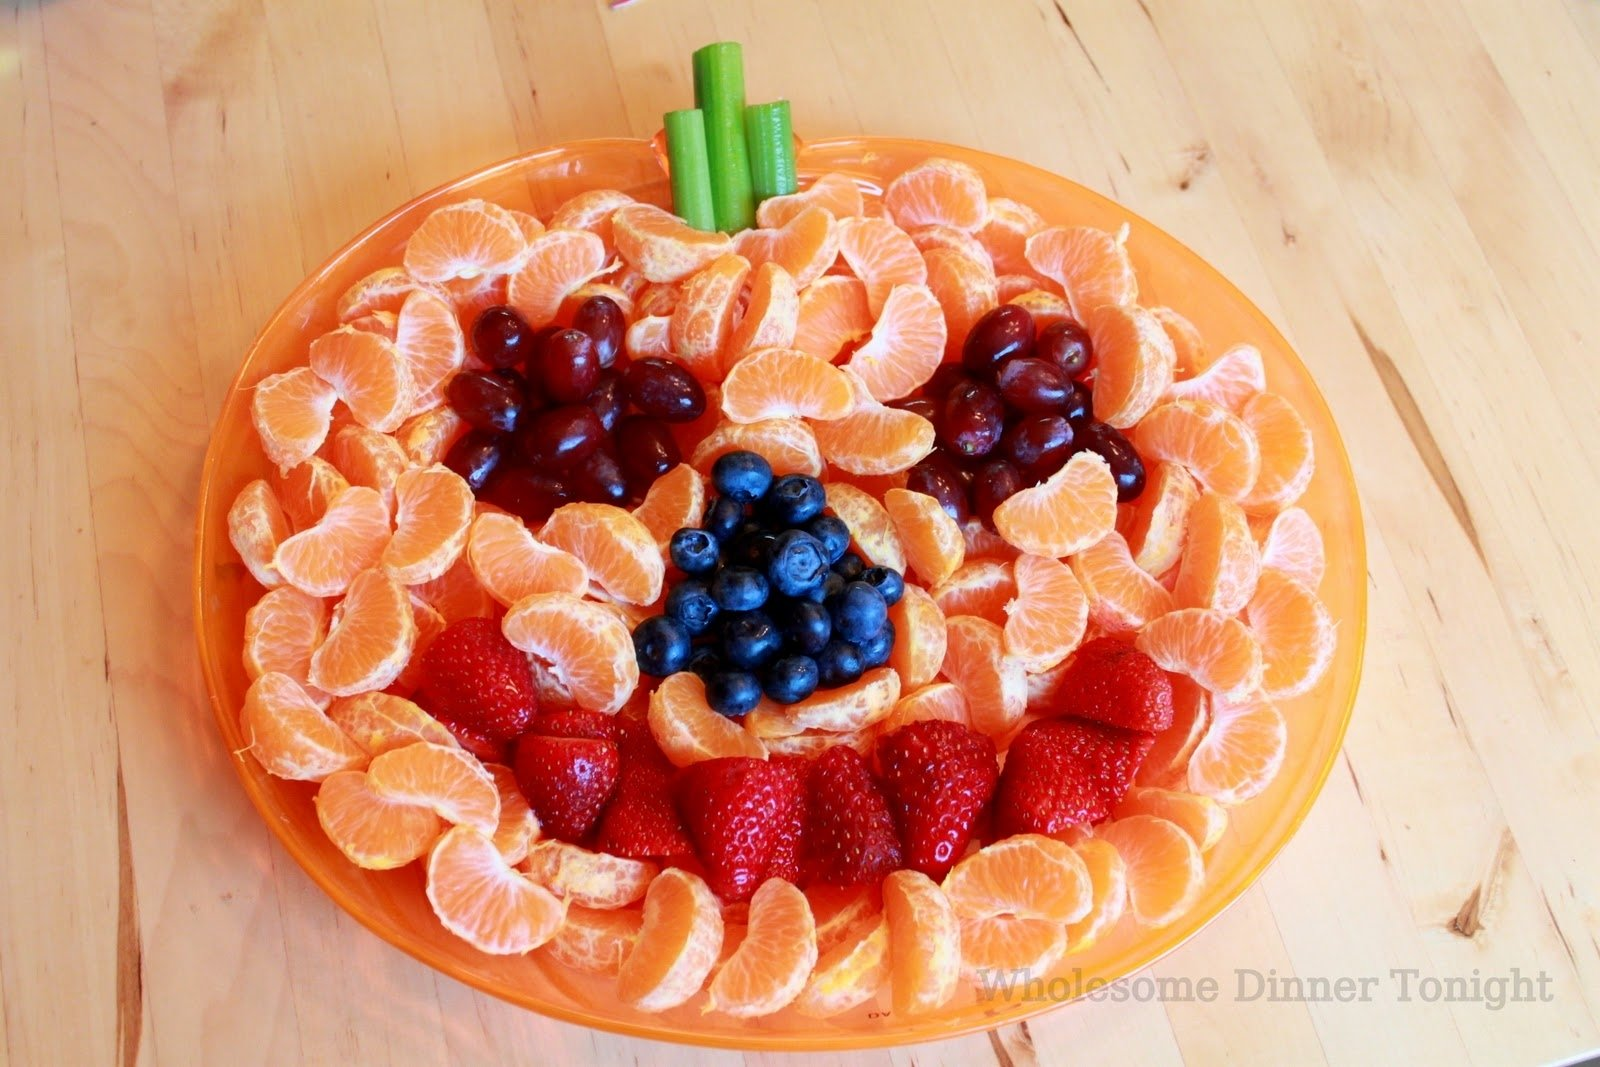 10 Great Kids Halloween Party Food Ideas top 15 paleo halloween treats party food ideas 2020